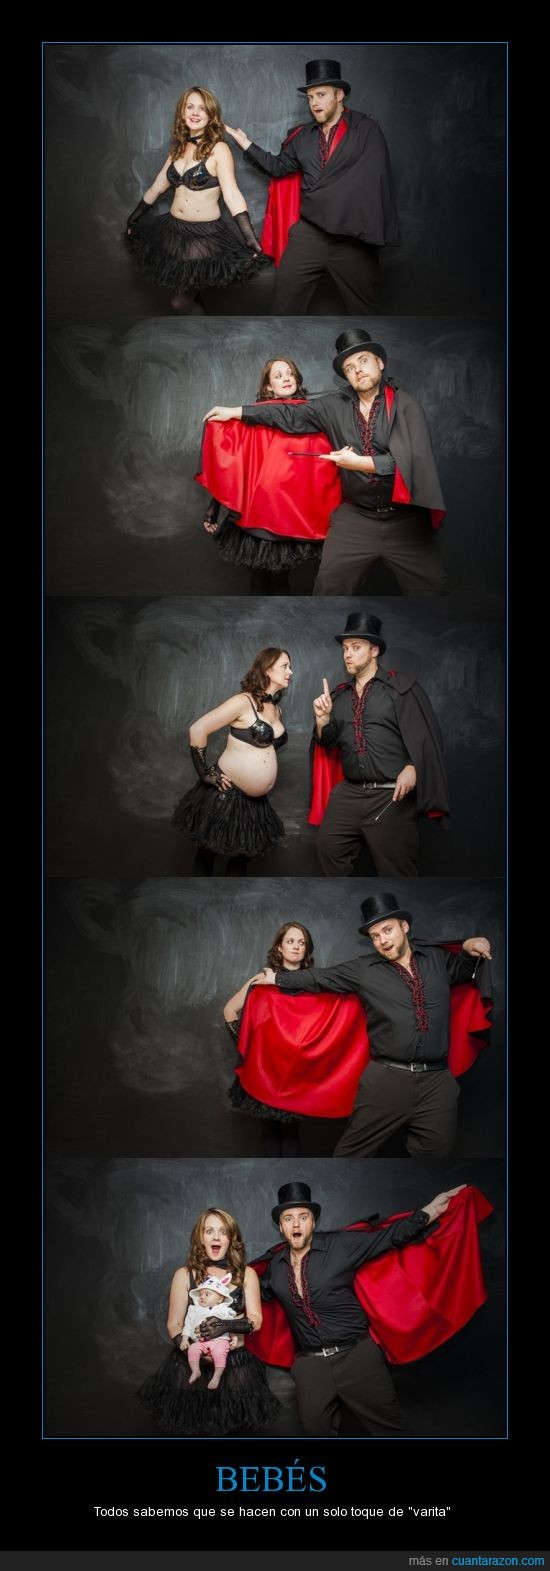 ayudante,Bebé,embarazada,magia,mago,niña,varita